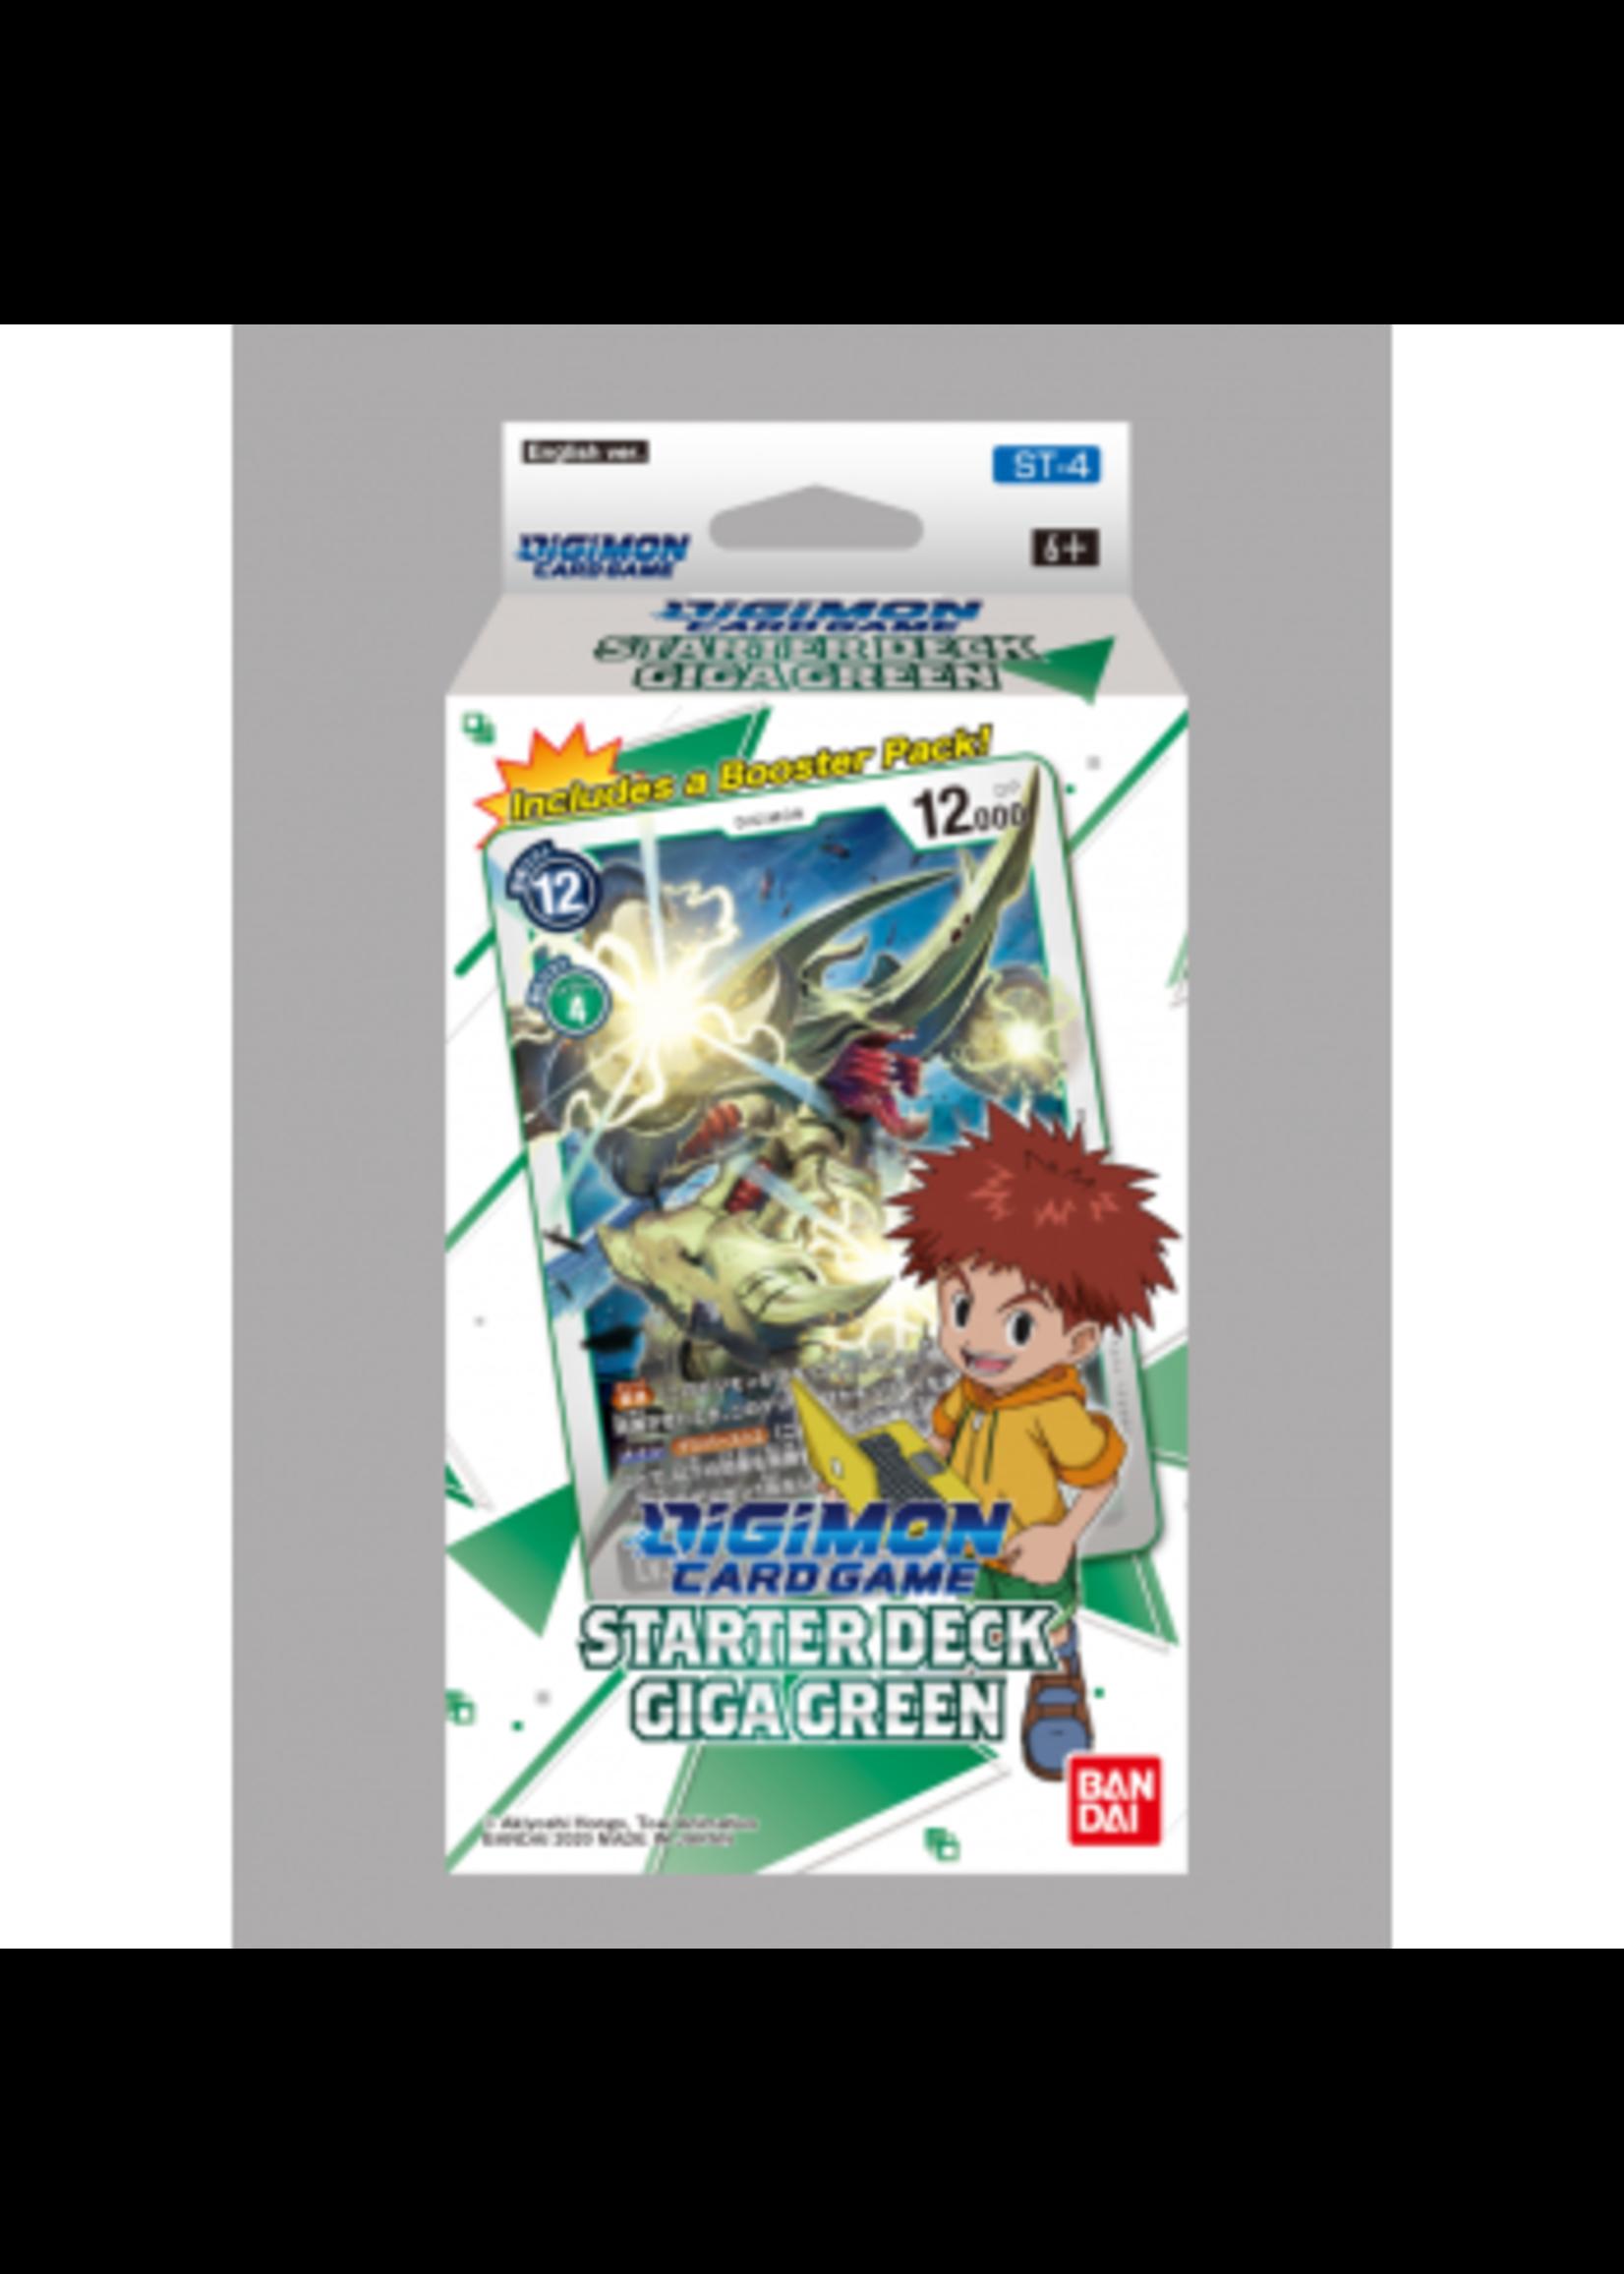 Digimon Card Game - Starter Deck Display Giga Green ST-4